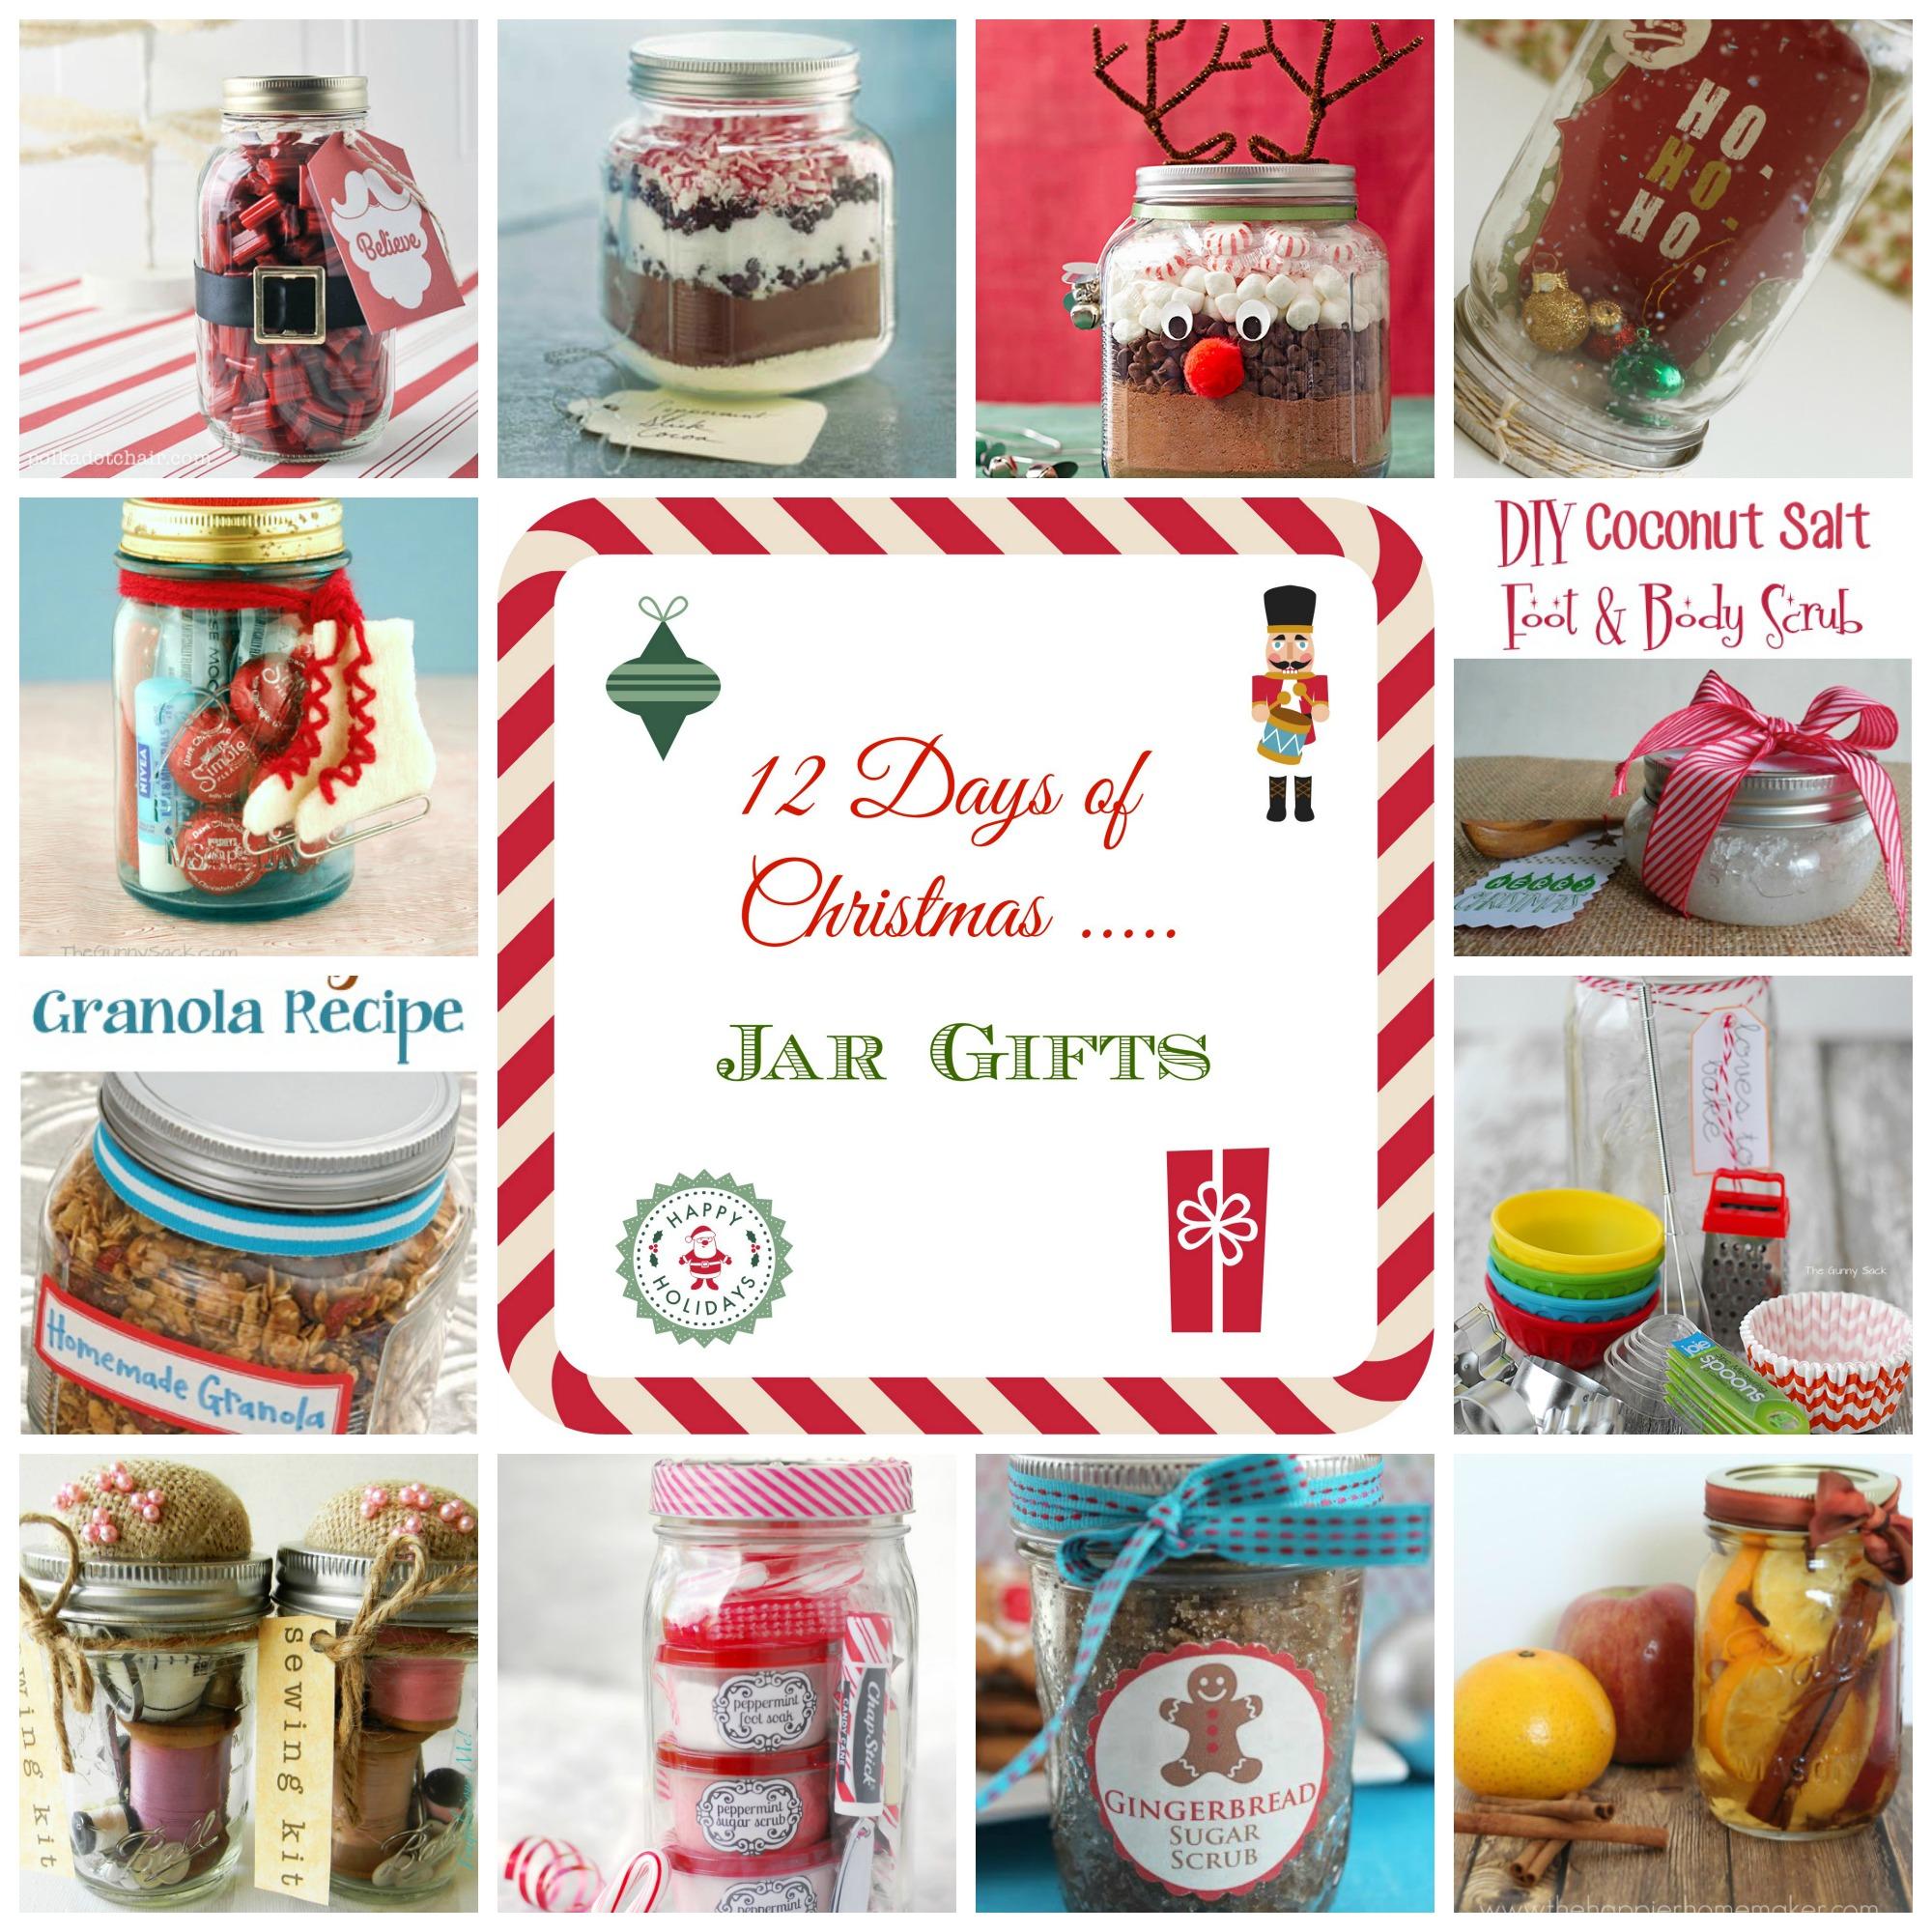 12 Days of Christmas – Jar Gifts